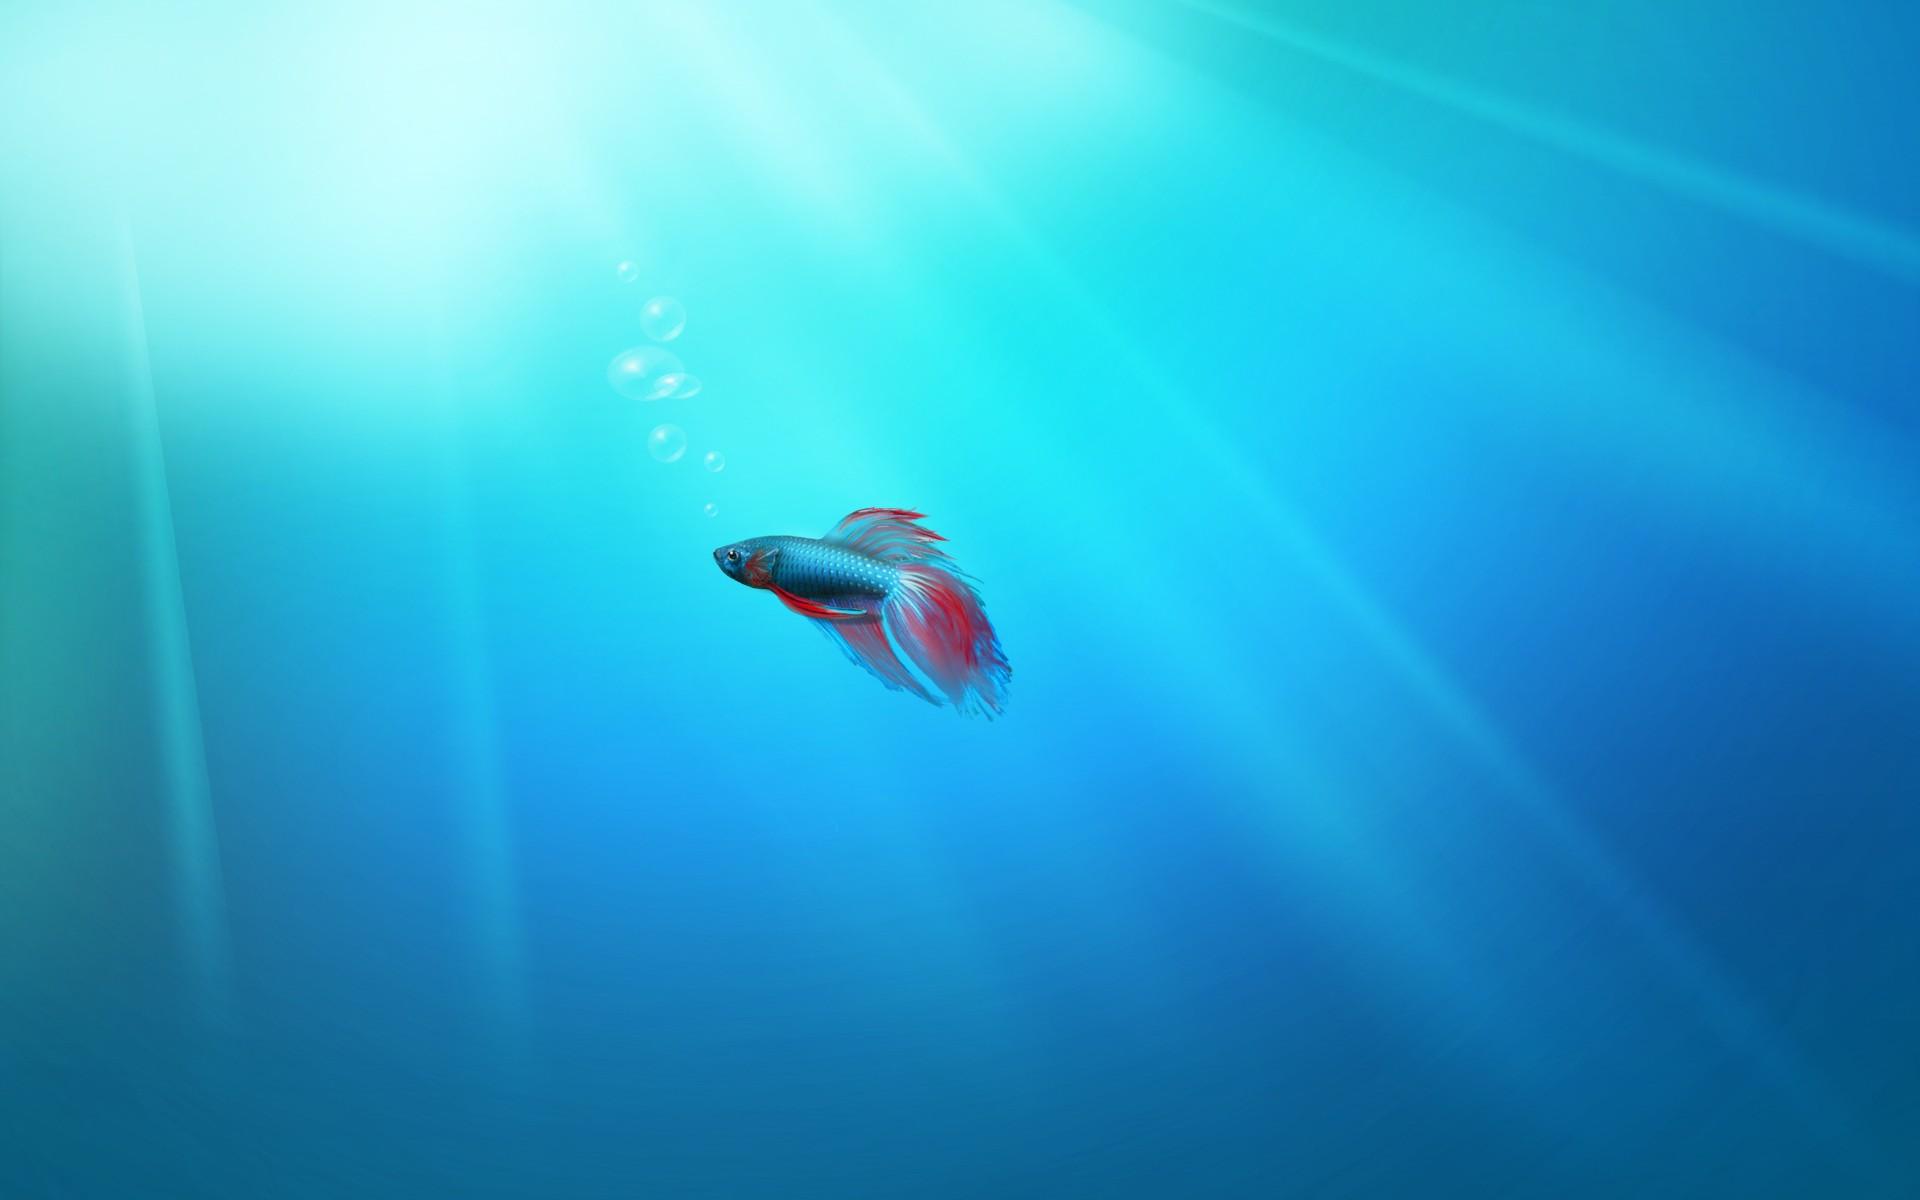 fish marlin desktop 1920x1200 - photo #47